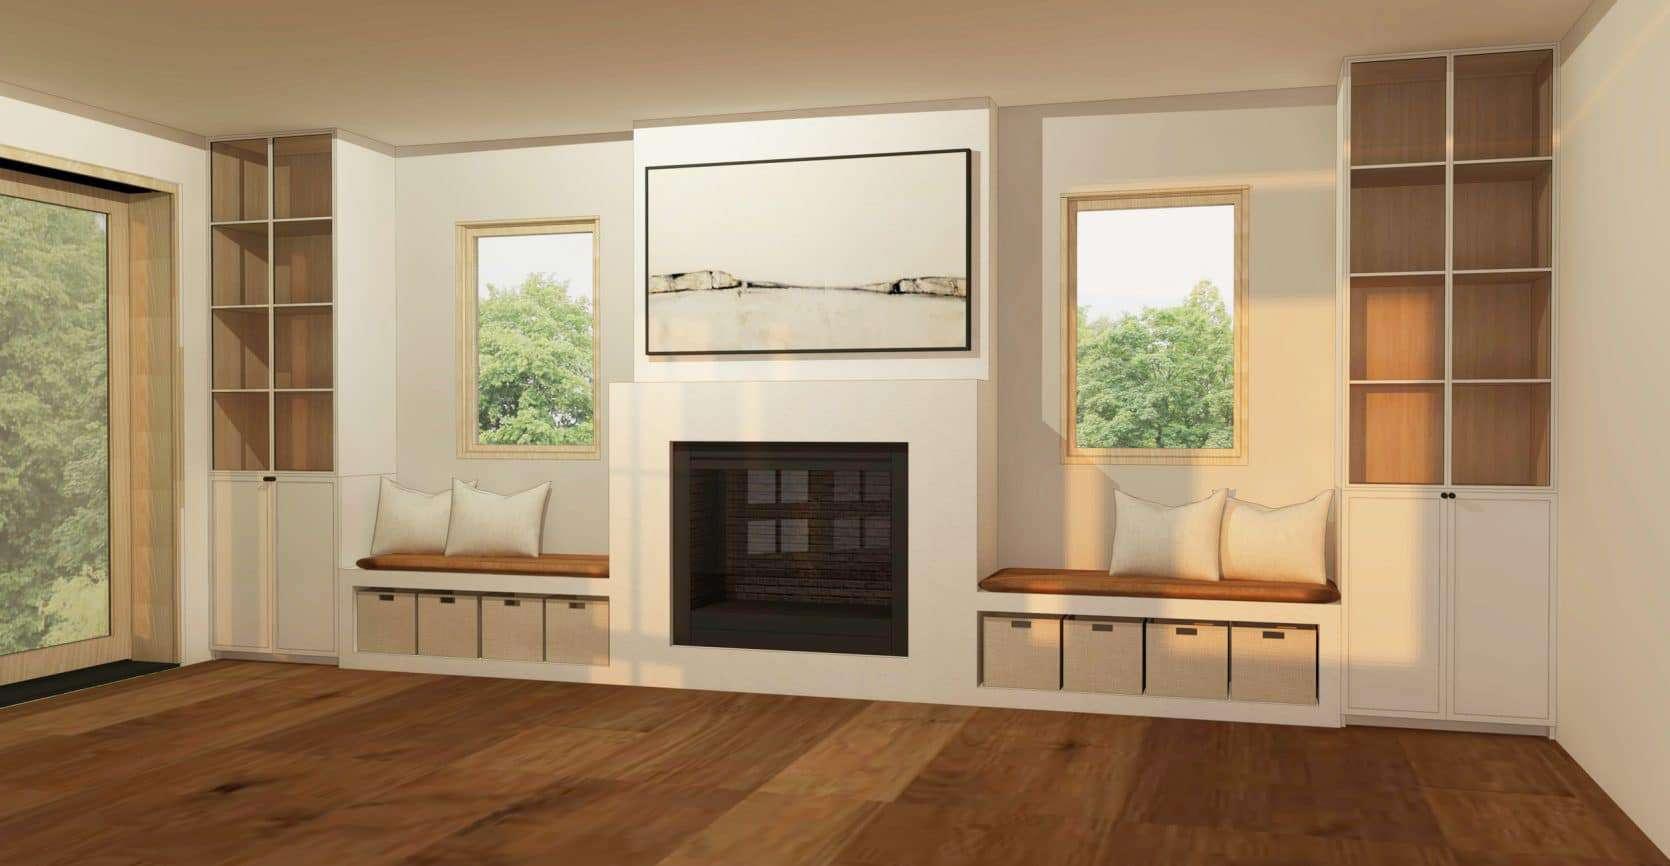 Emily Henderson Mountain Fixer Upper Family Room Fireplace Final Design White Baskets 1670x866